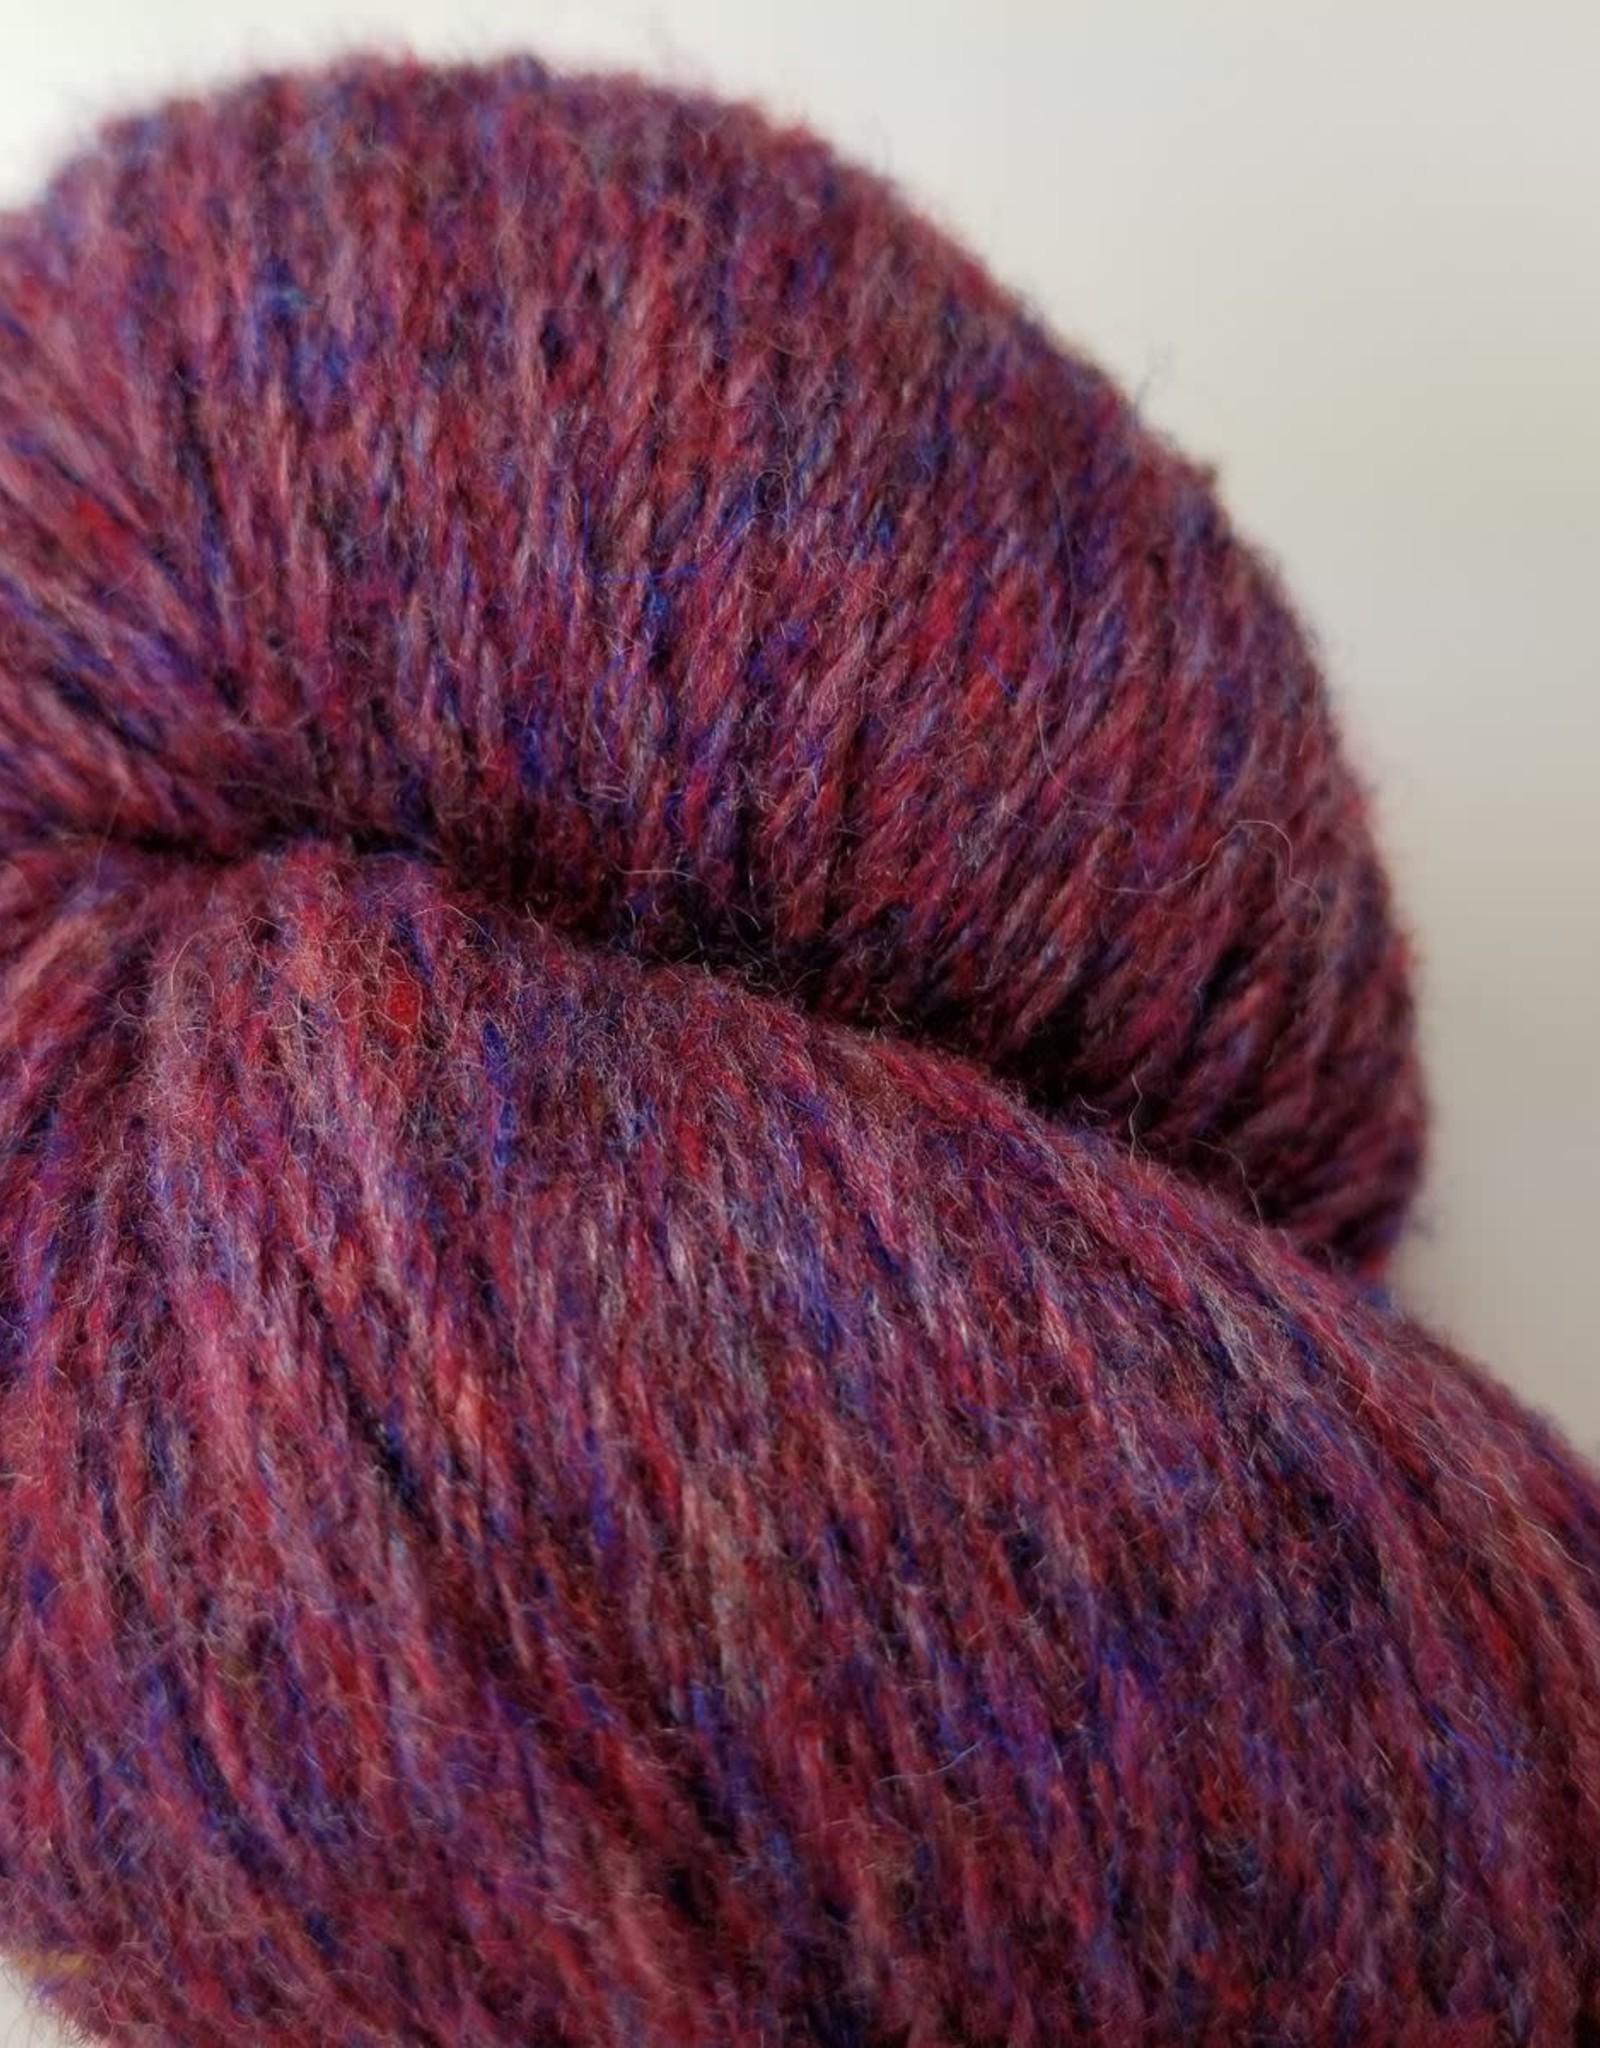 CWM 4-ply Sock 4oz 3 berry pi